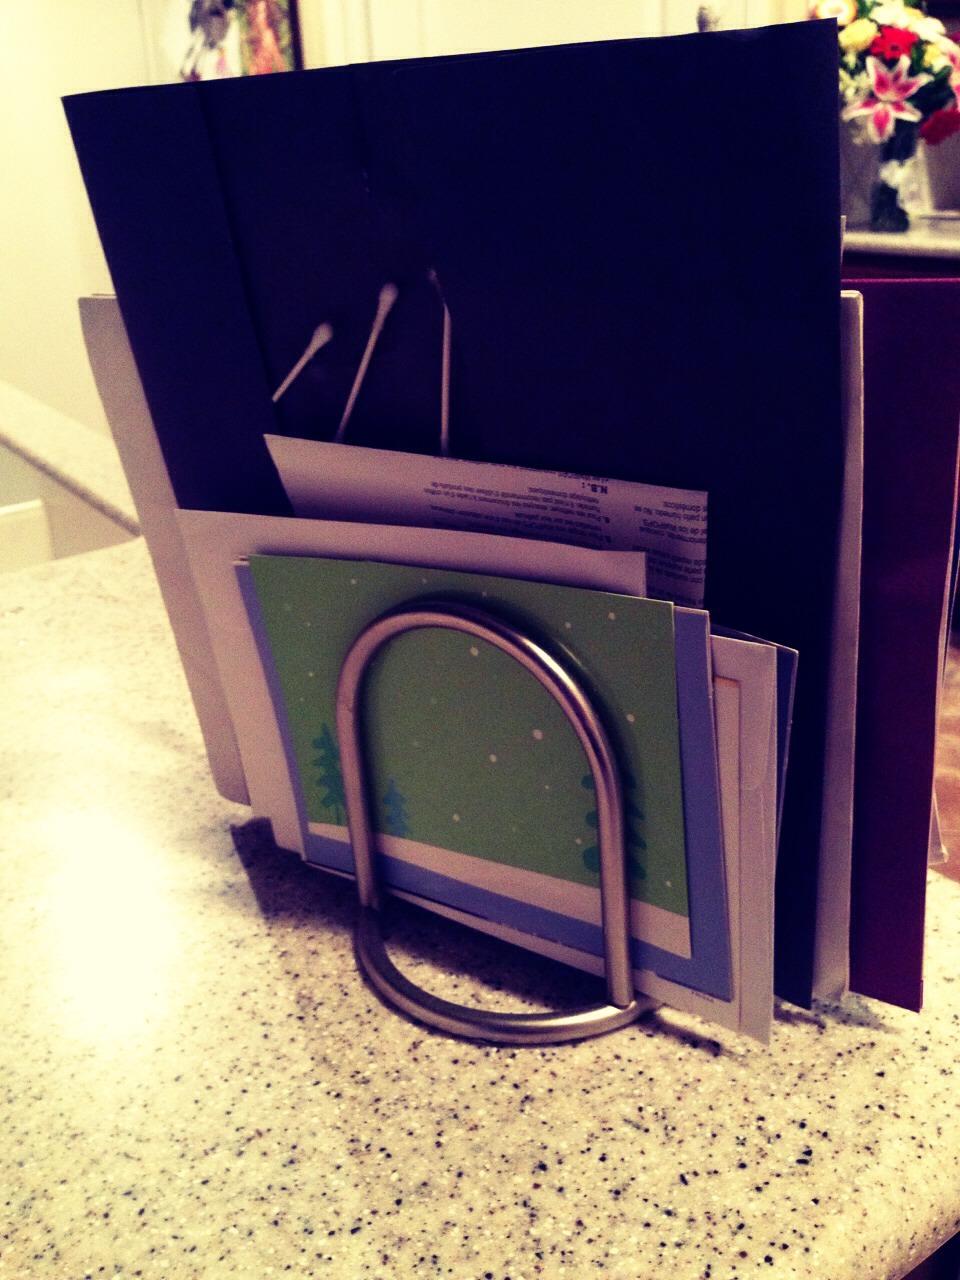 Mail, folders, school work, cards, etc.